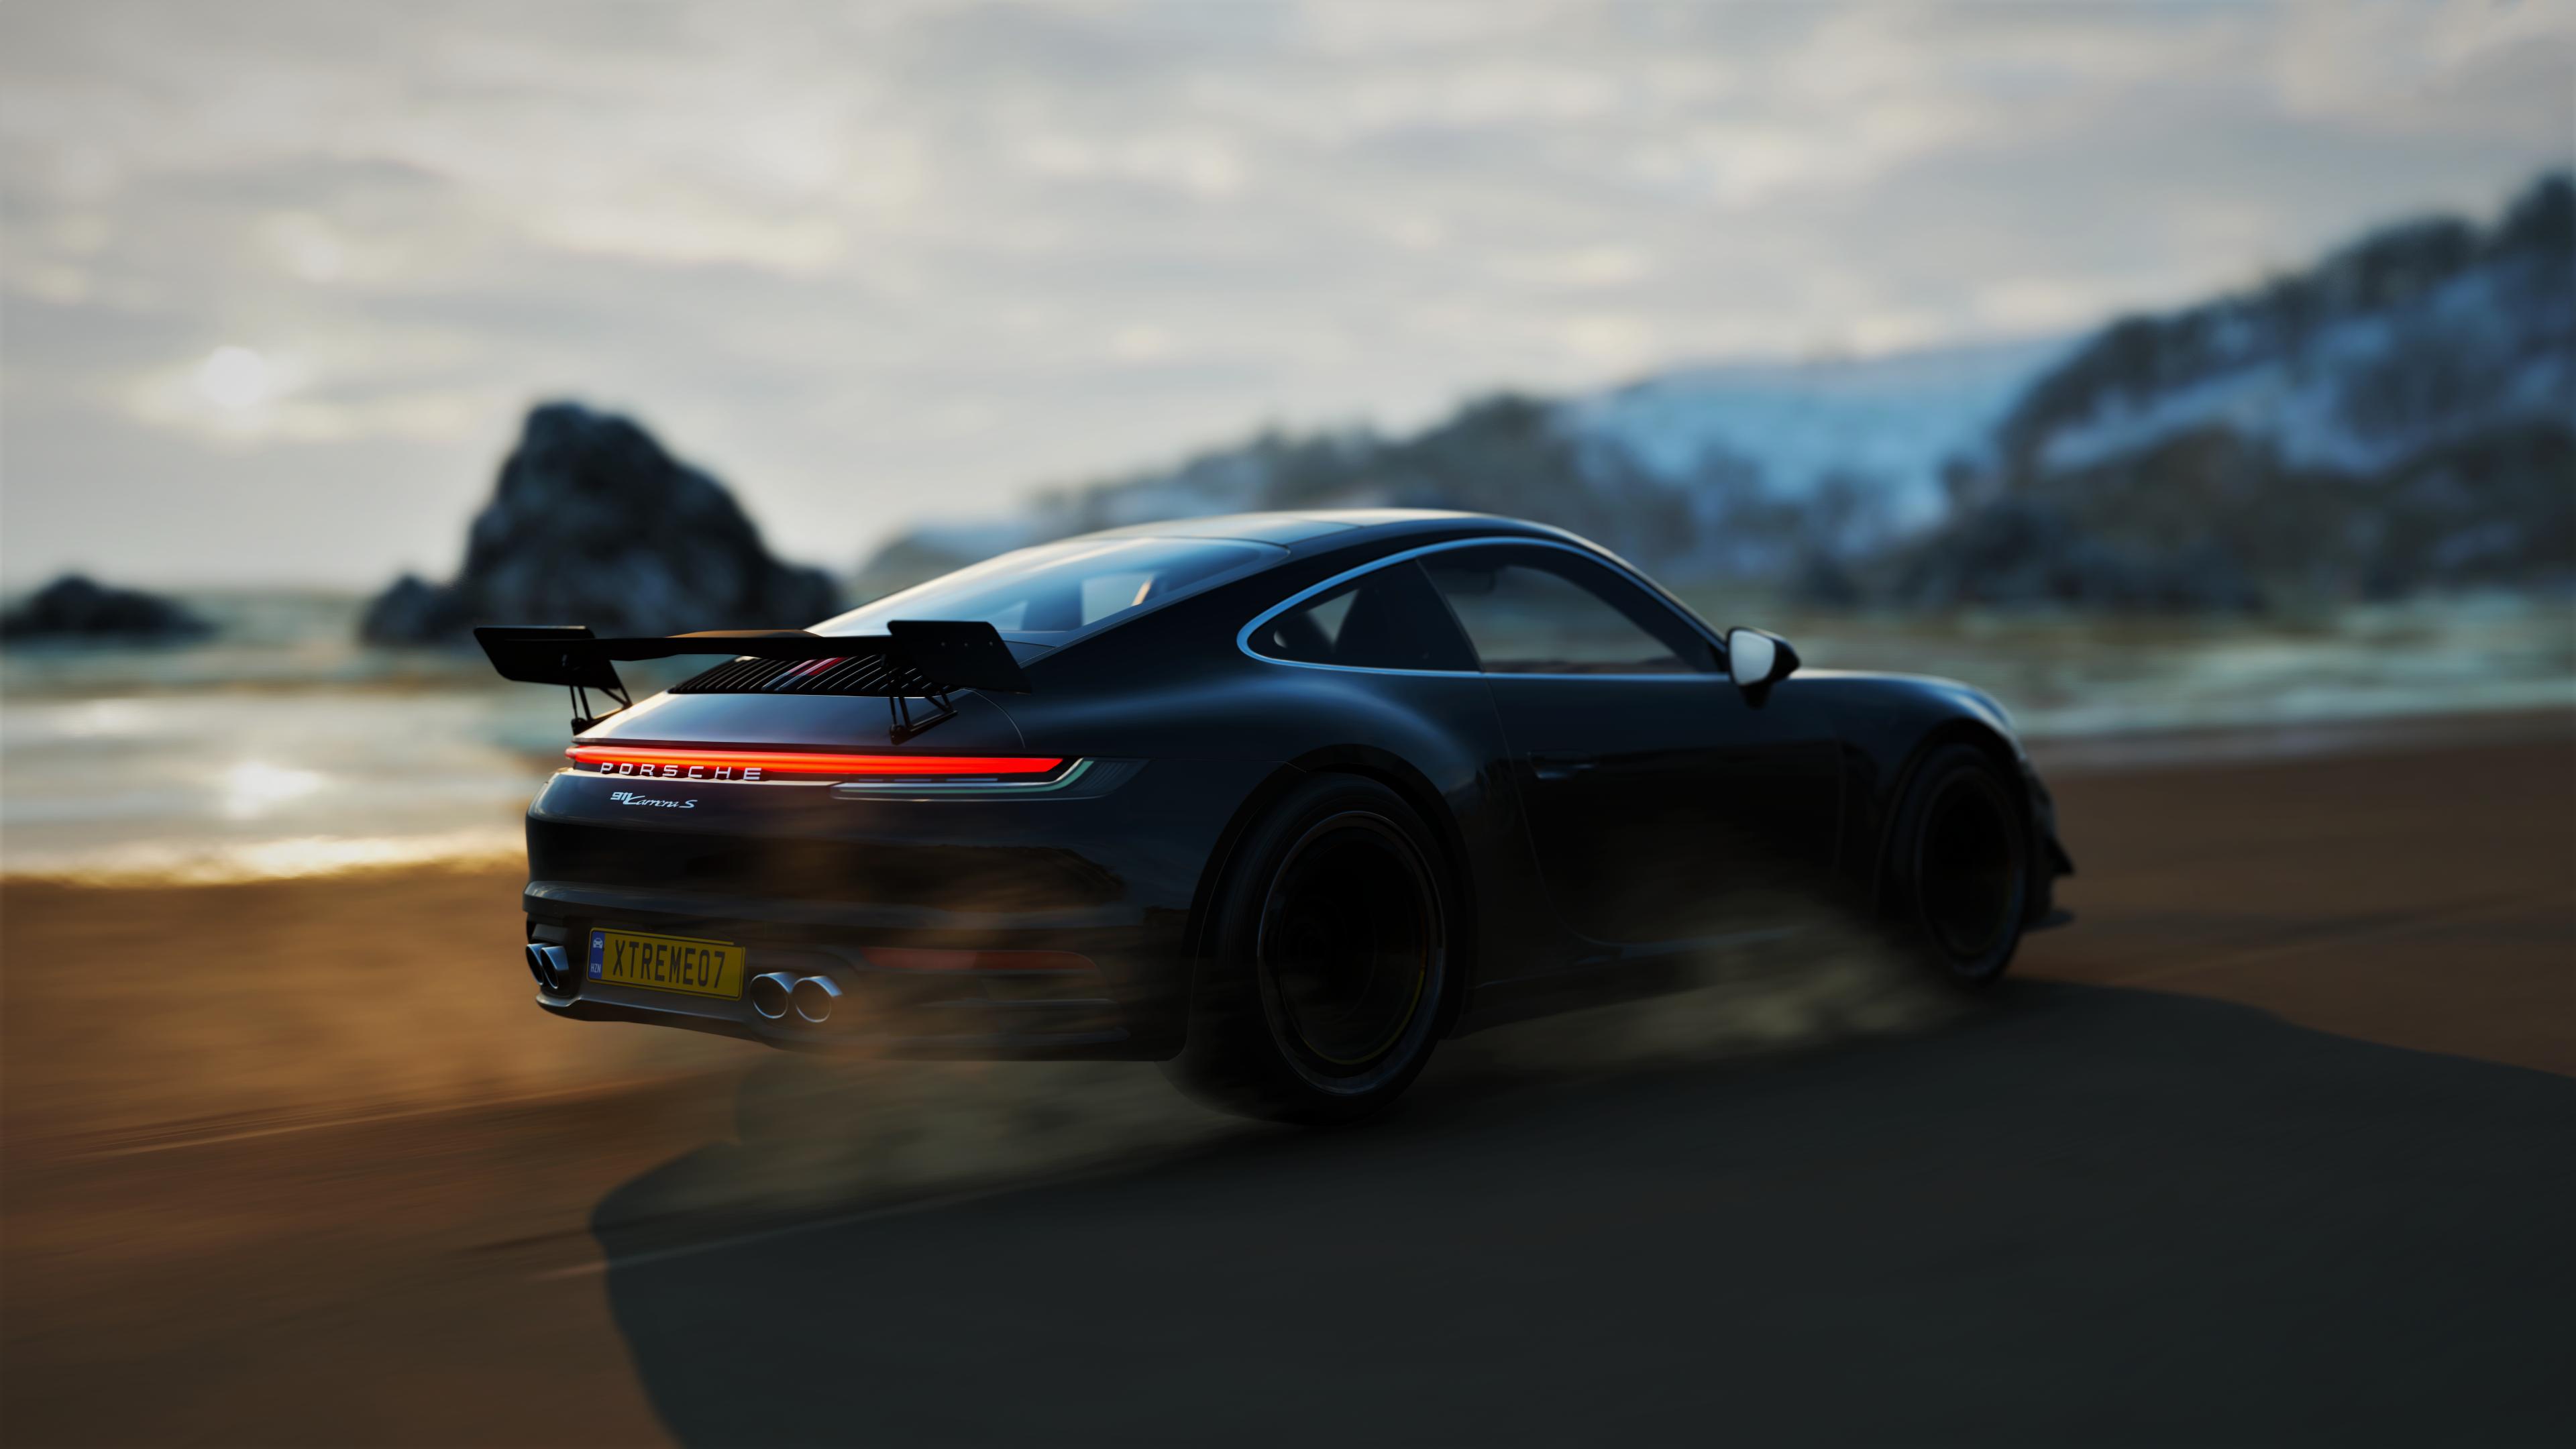 4k Clean Porsche Wallpaper 3840x2160 Forza Horizon 4 Forza Horizon 4 Forza Horizon Forza